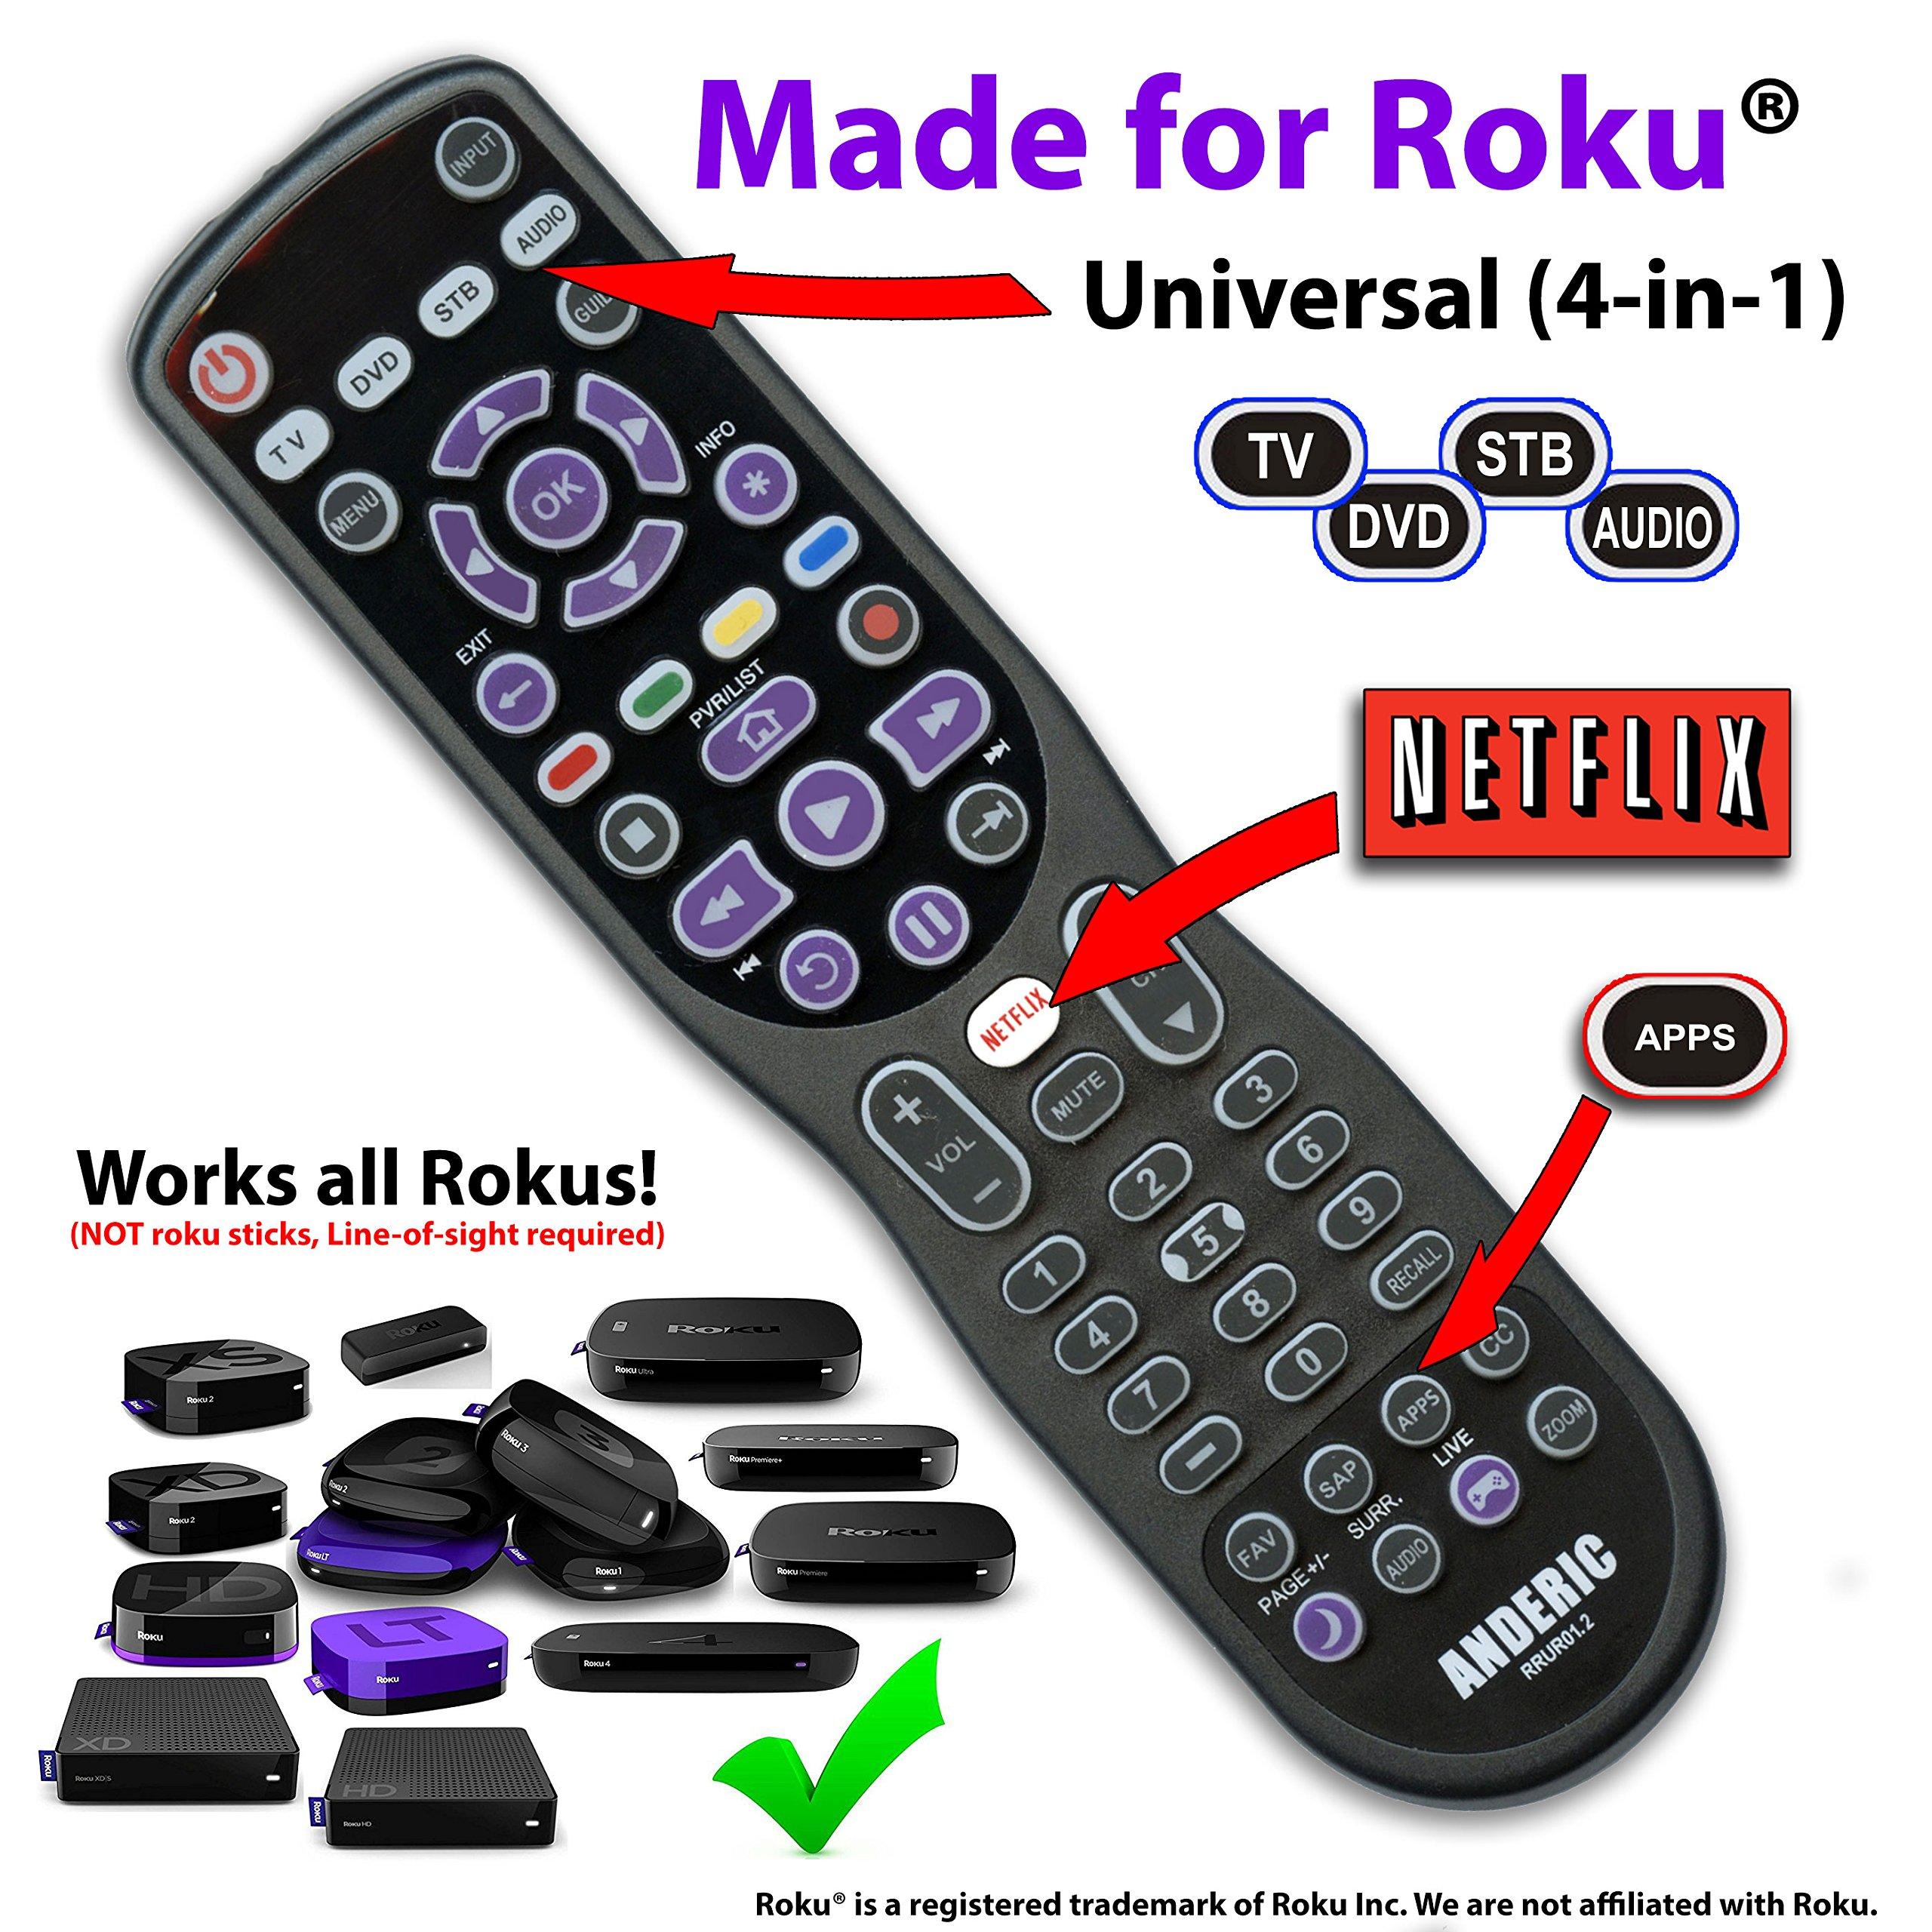 Made for Roku Anderic 4-Device Universal Remote Control for ALL TVs/Roku TVs/HDTVs/Smart (& Dumb) TVs/Blu-Ray Players/Audio/Sound Bars/Roku Universal Remote - RRUR01.2